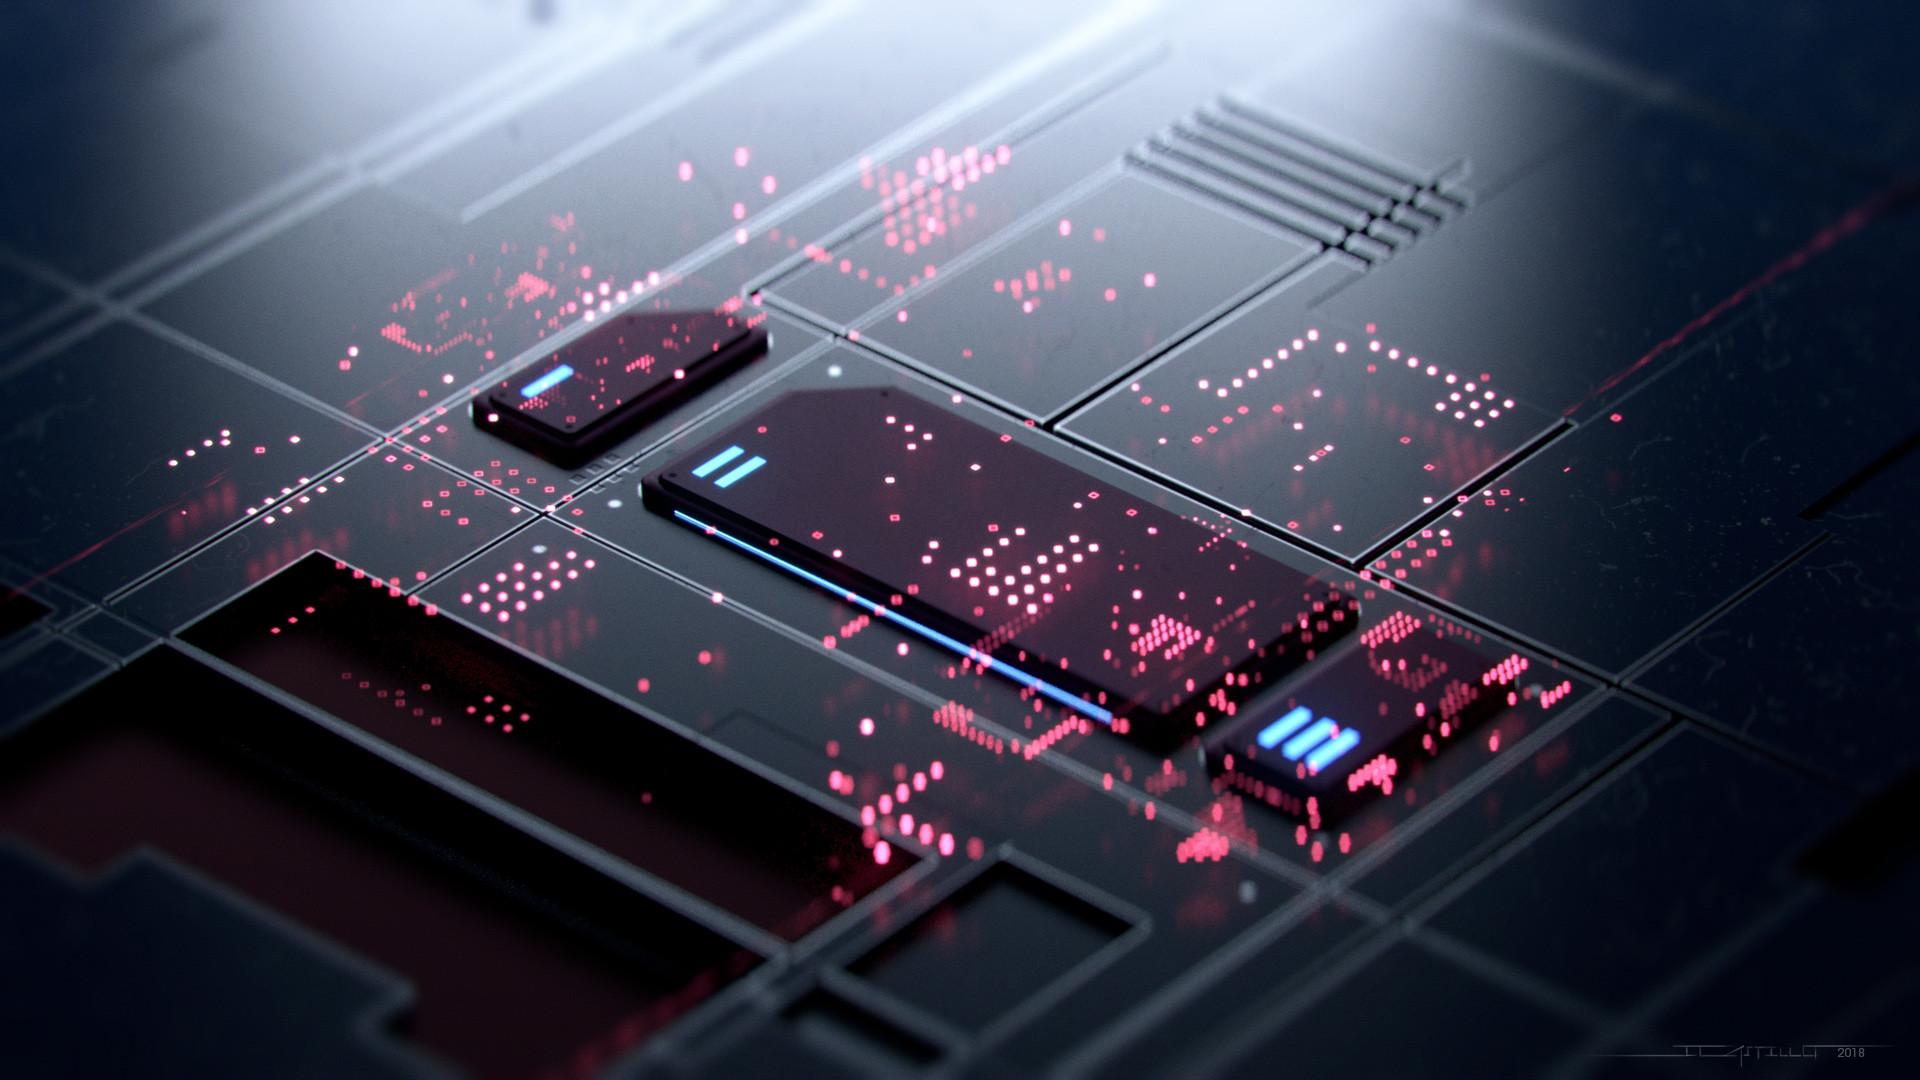 General 1920x1080 3D circuits digital art technology Jorge Castillo